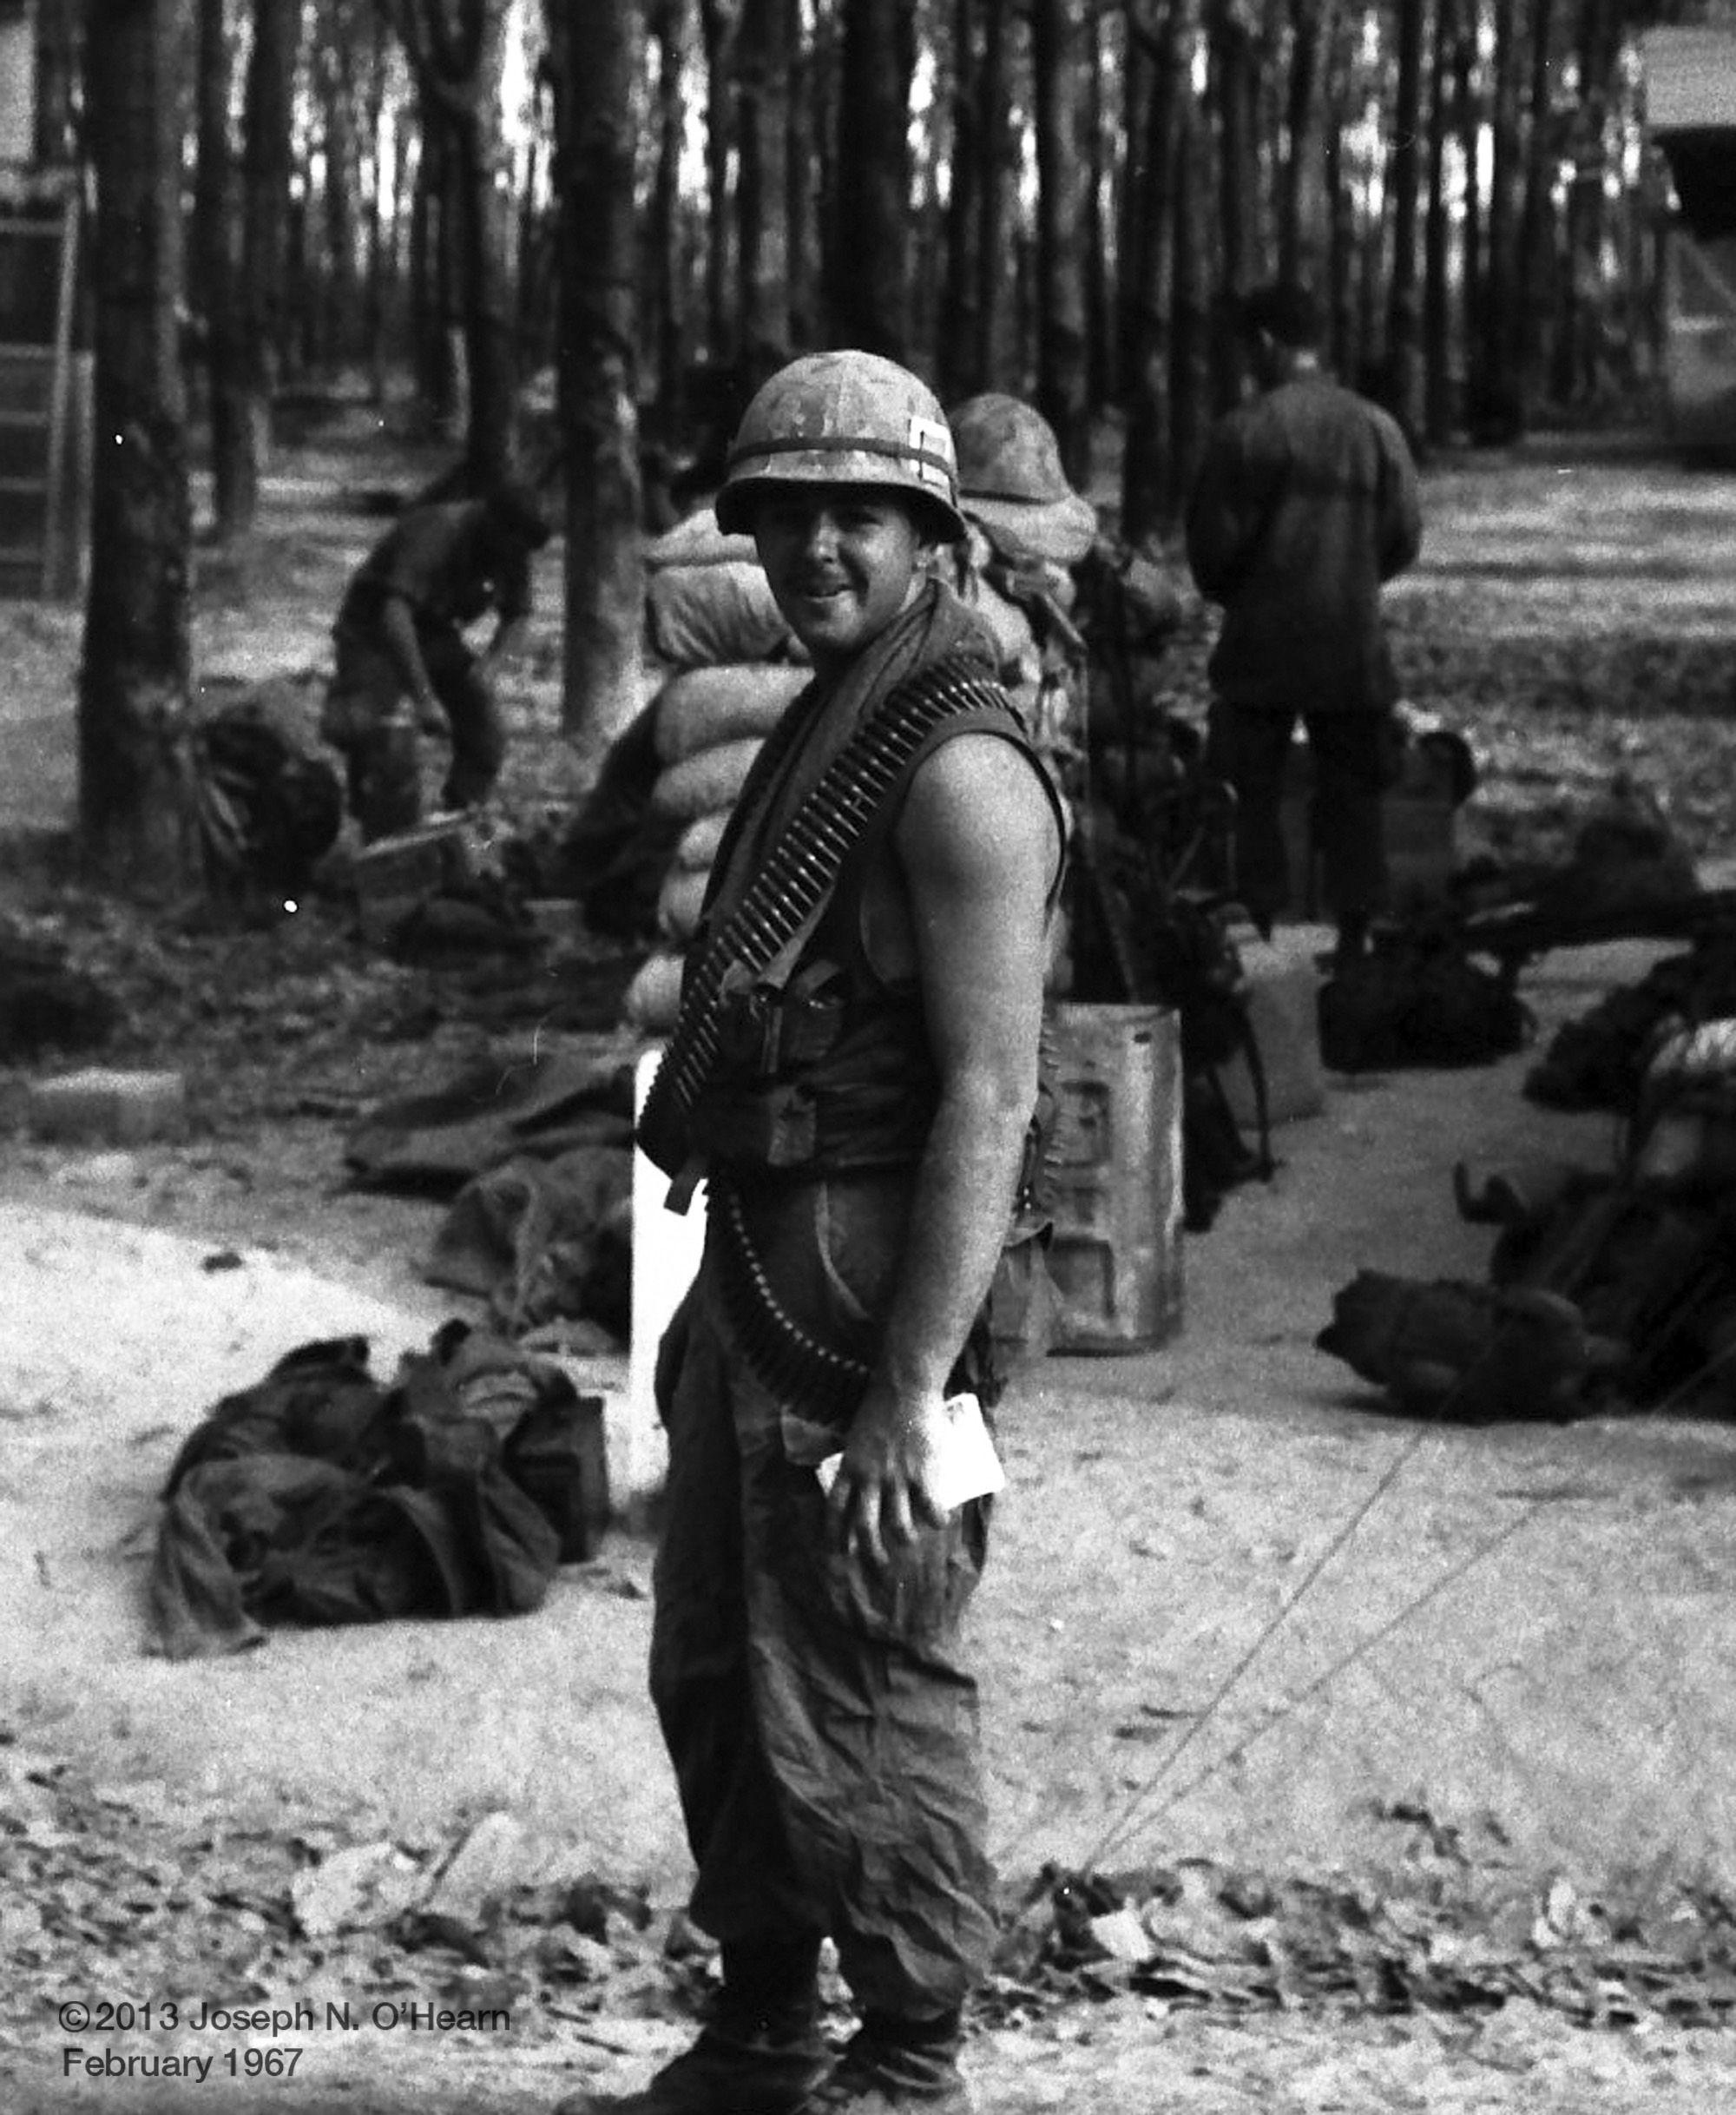 marines tet offensive vietnam war history vietnam war marines tet offensive 1968 vietnam war